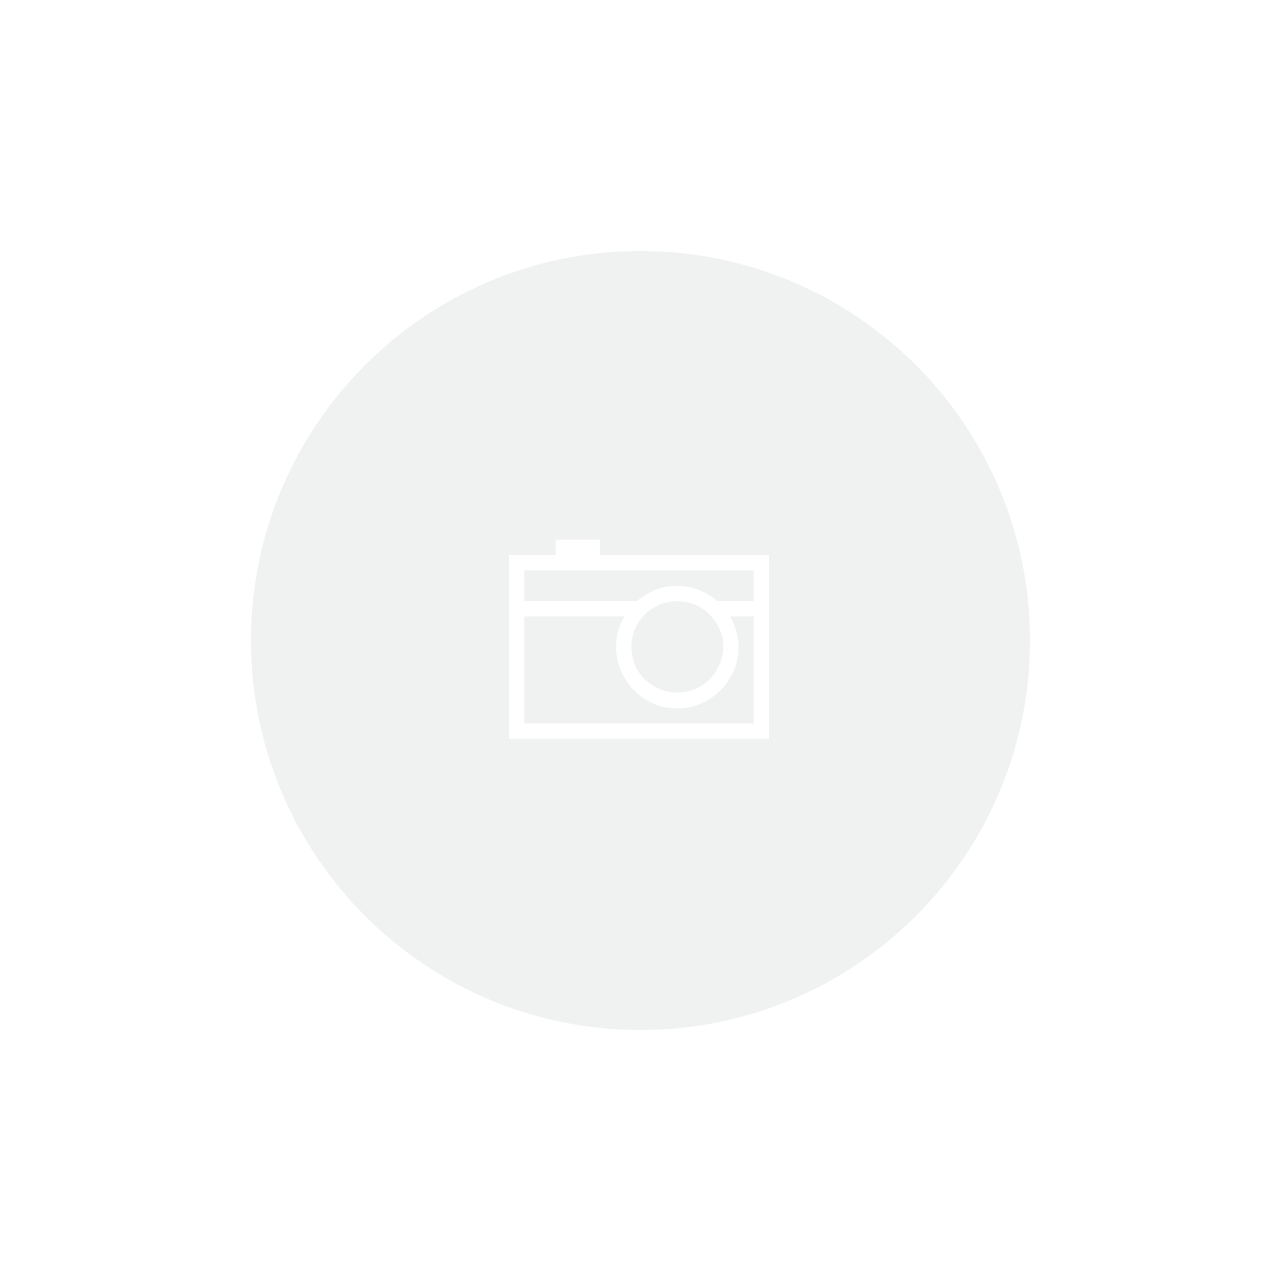 Colher de Mesa Marselha Tramontina Designcollection